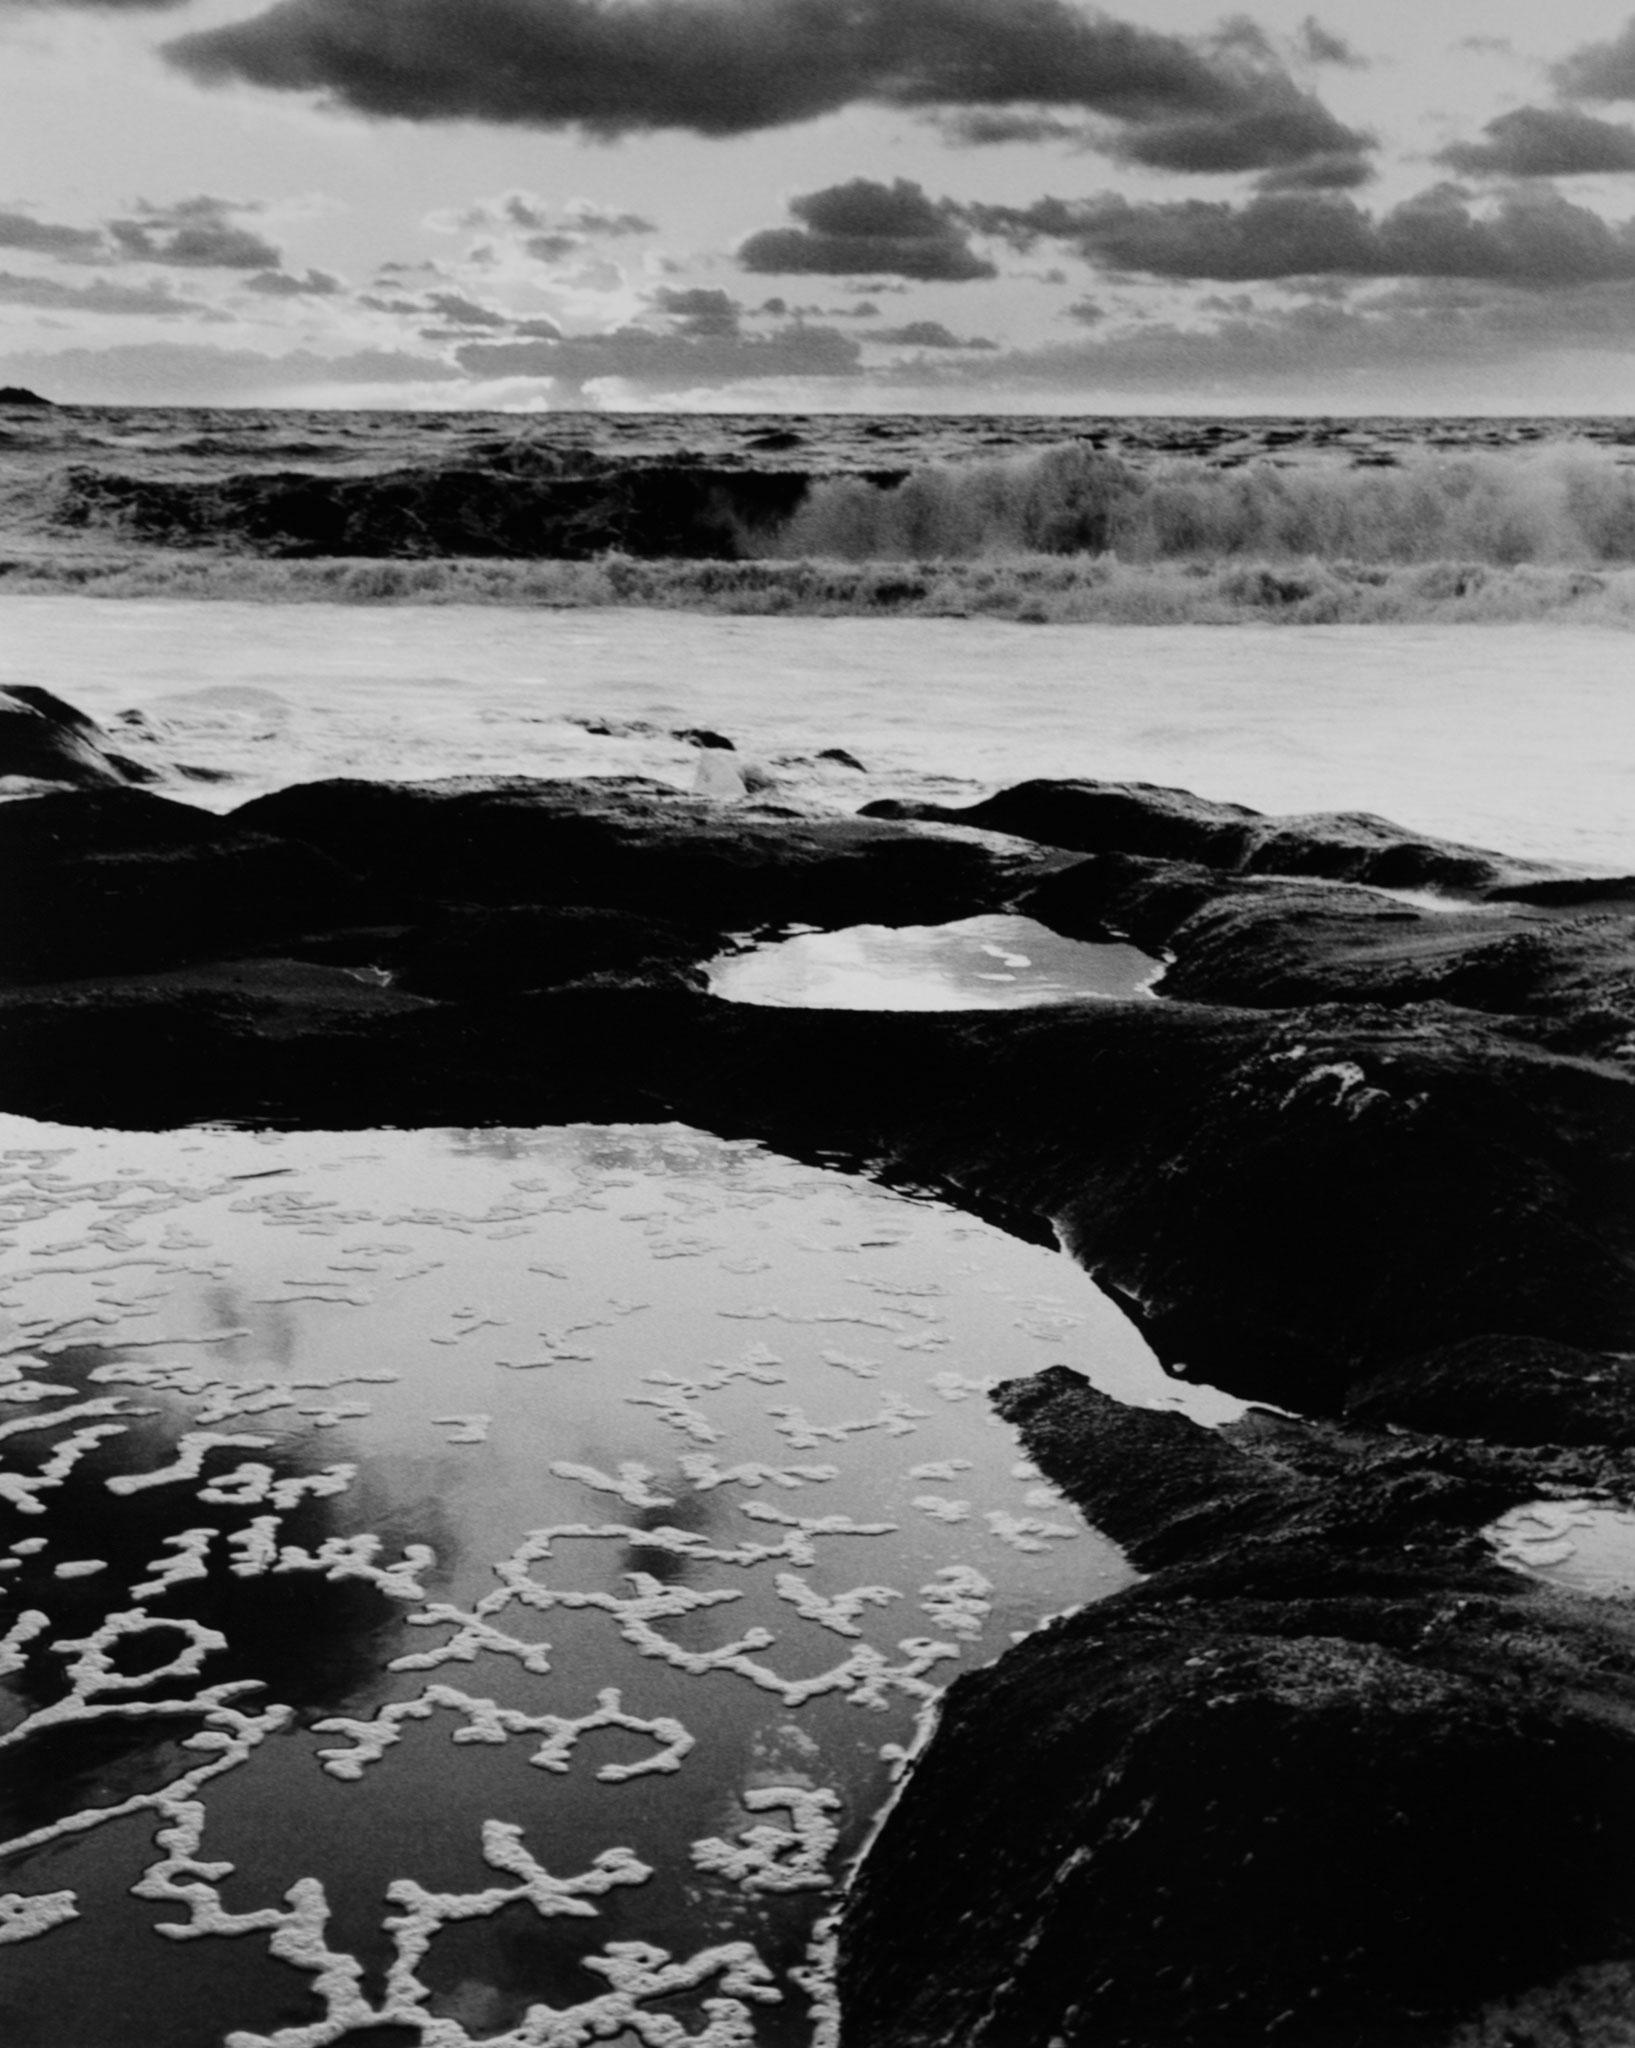 River-Beach-Tidal-Pool.jpg